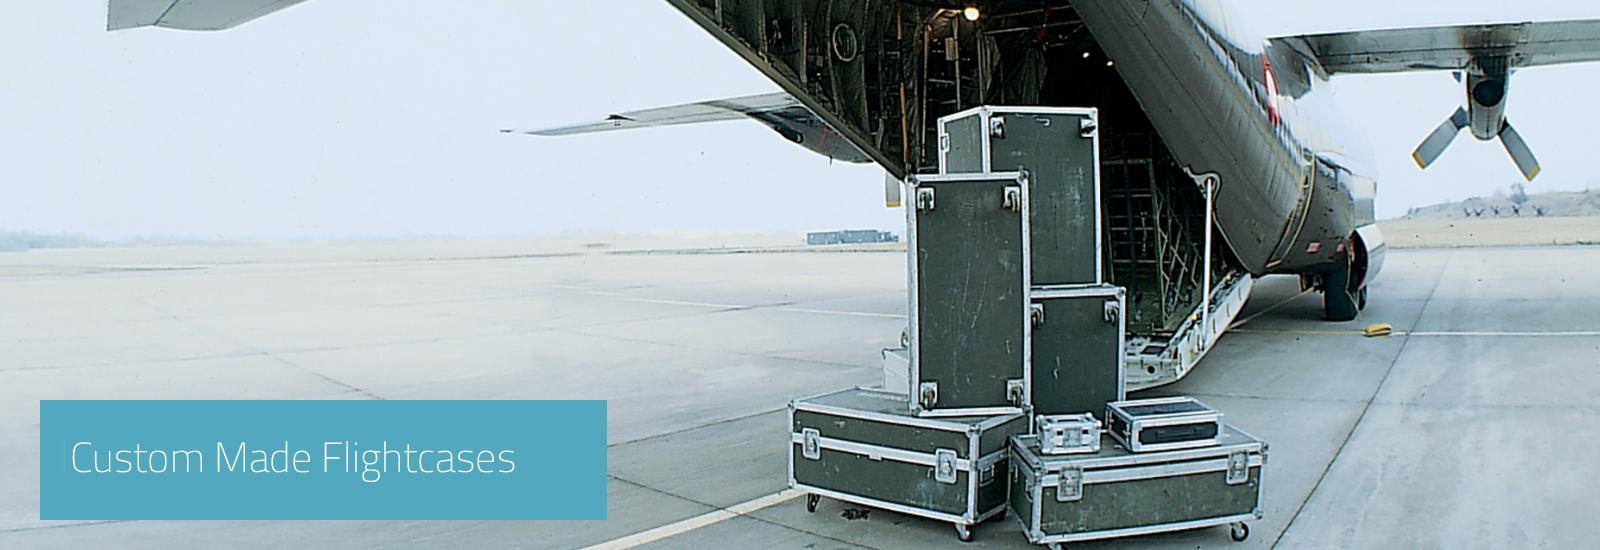 Flightcases International A/S